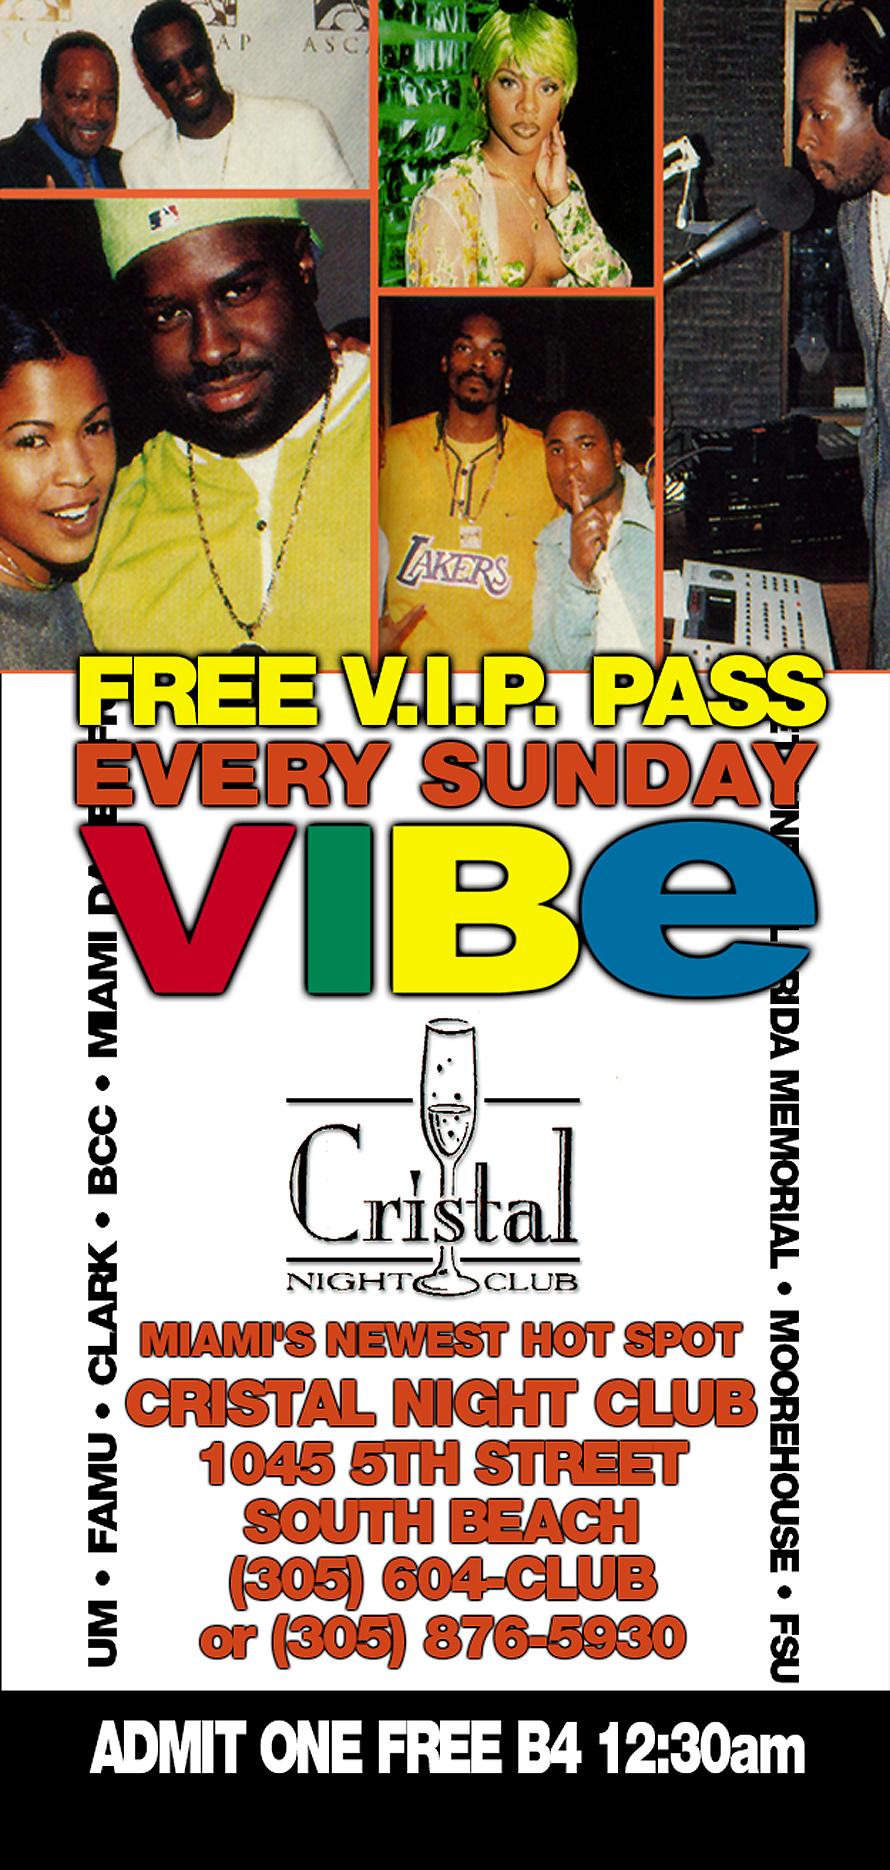 Free VIP Pass at Cristal Nightclub